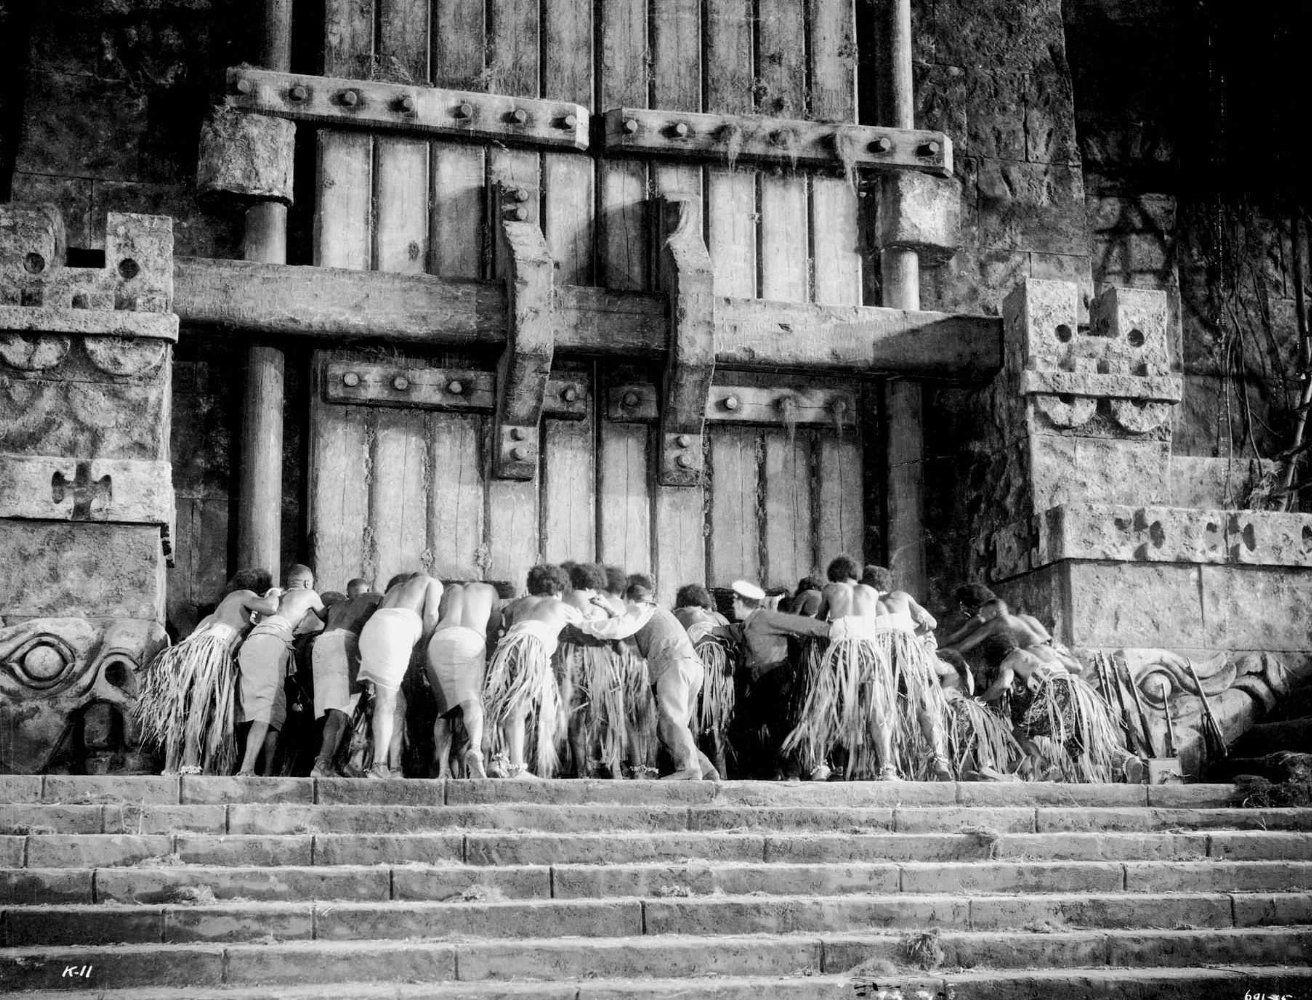 NEOSTAR :: (04) 킹콩 대 고질라 (1962),동 서양 최고 괴수를 맞붙인 세기적 괴작. |King Kong Native People